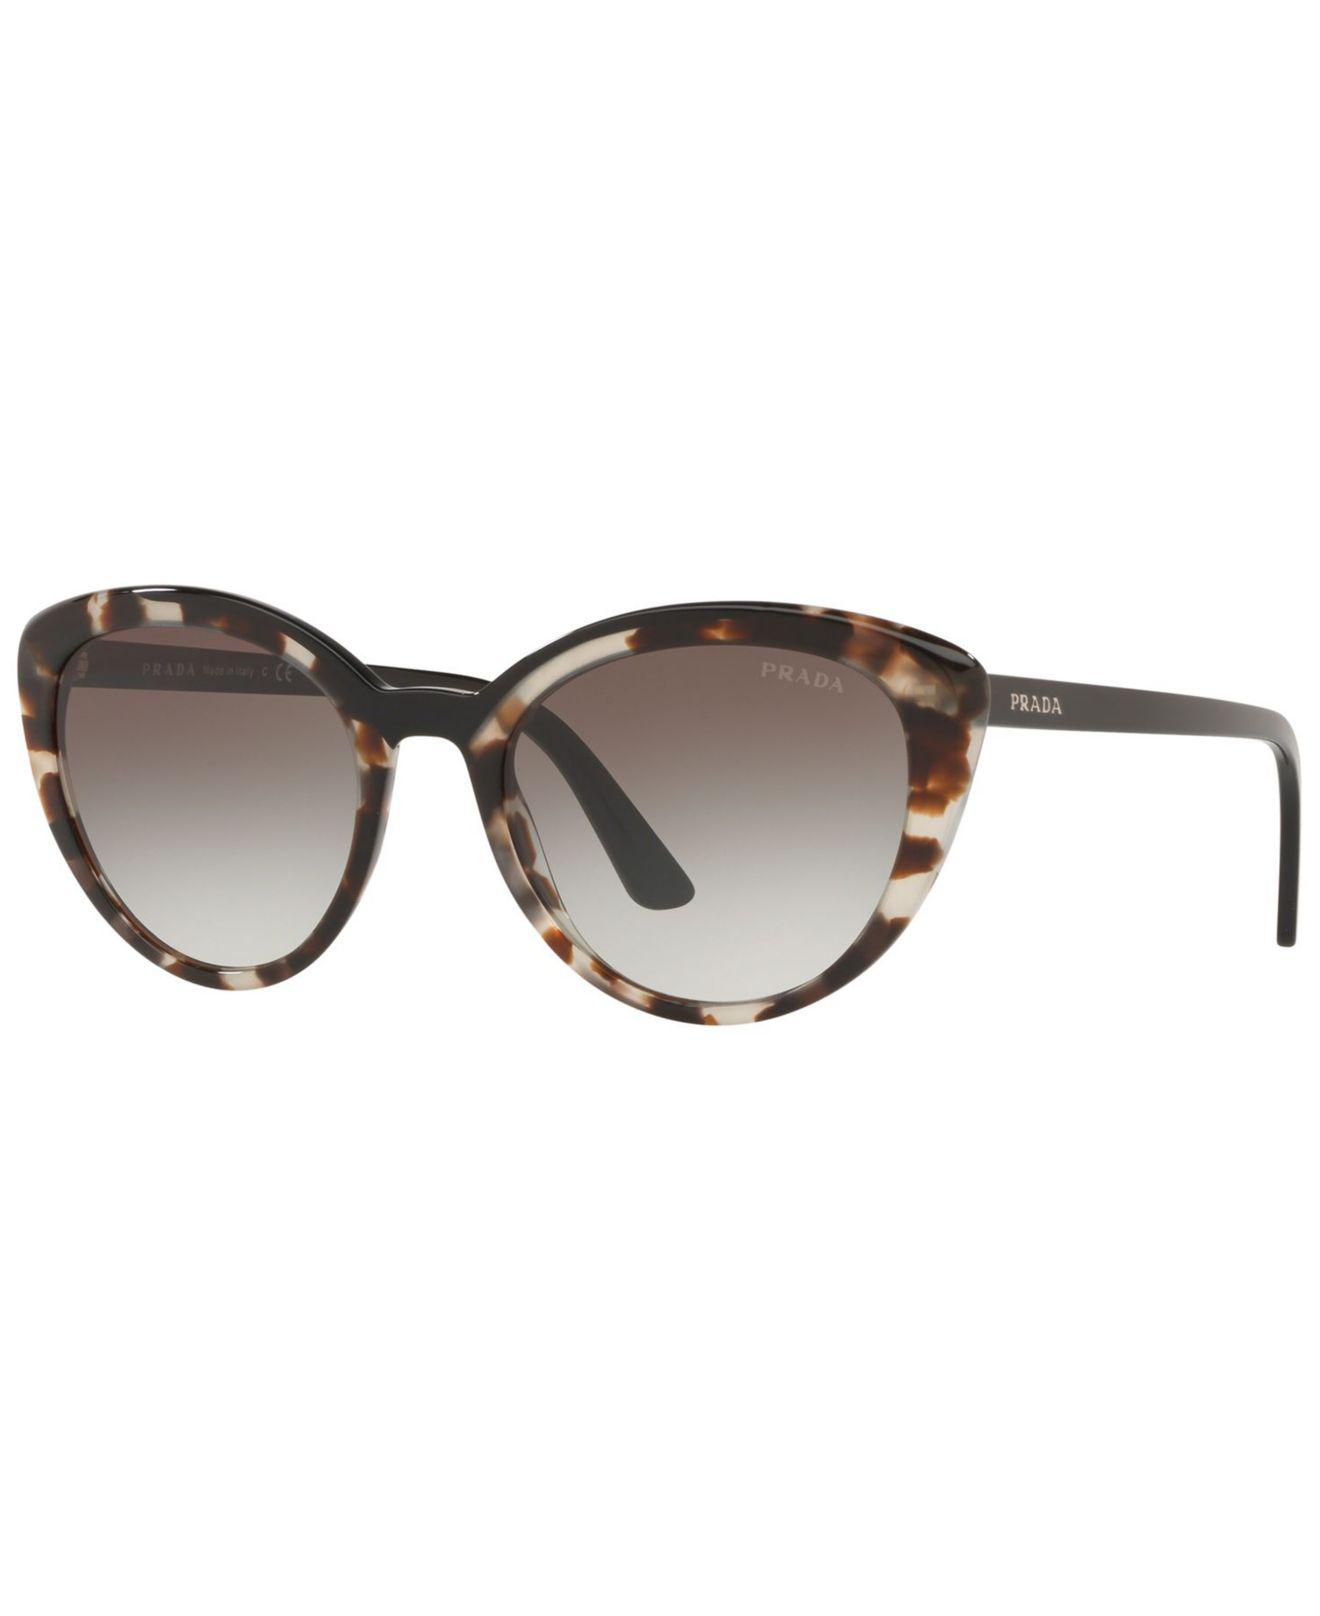 07df4abd1f28 Prada - Gray 54mm Cat Eye Sunglasses - Opal Brown Gradient - Lyst. View  fullscreen